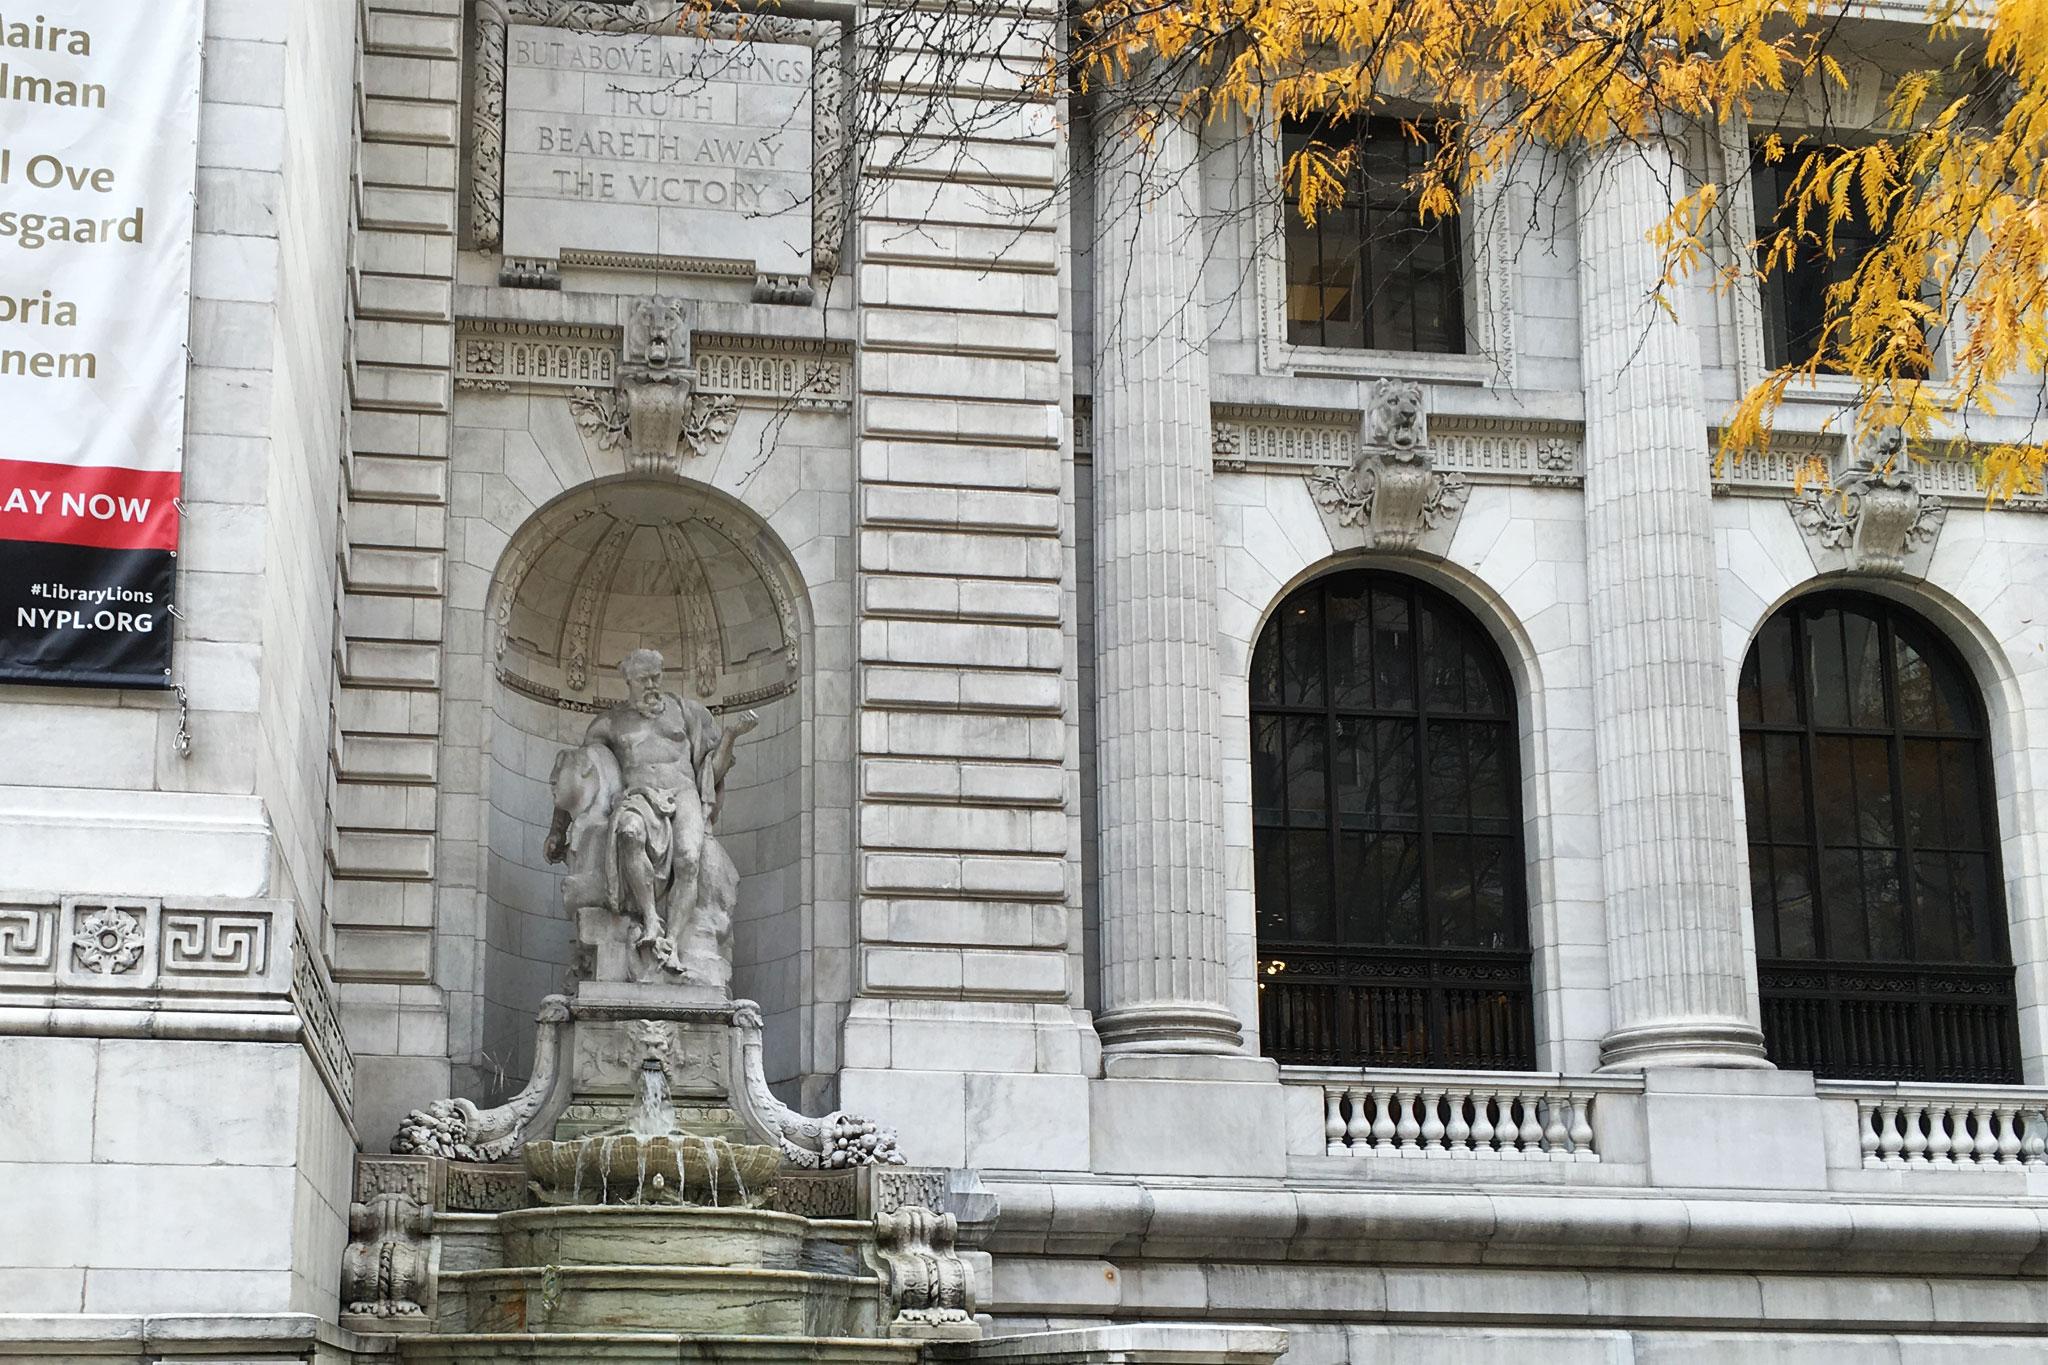 NY Public Library 5th Avenue Fountains